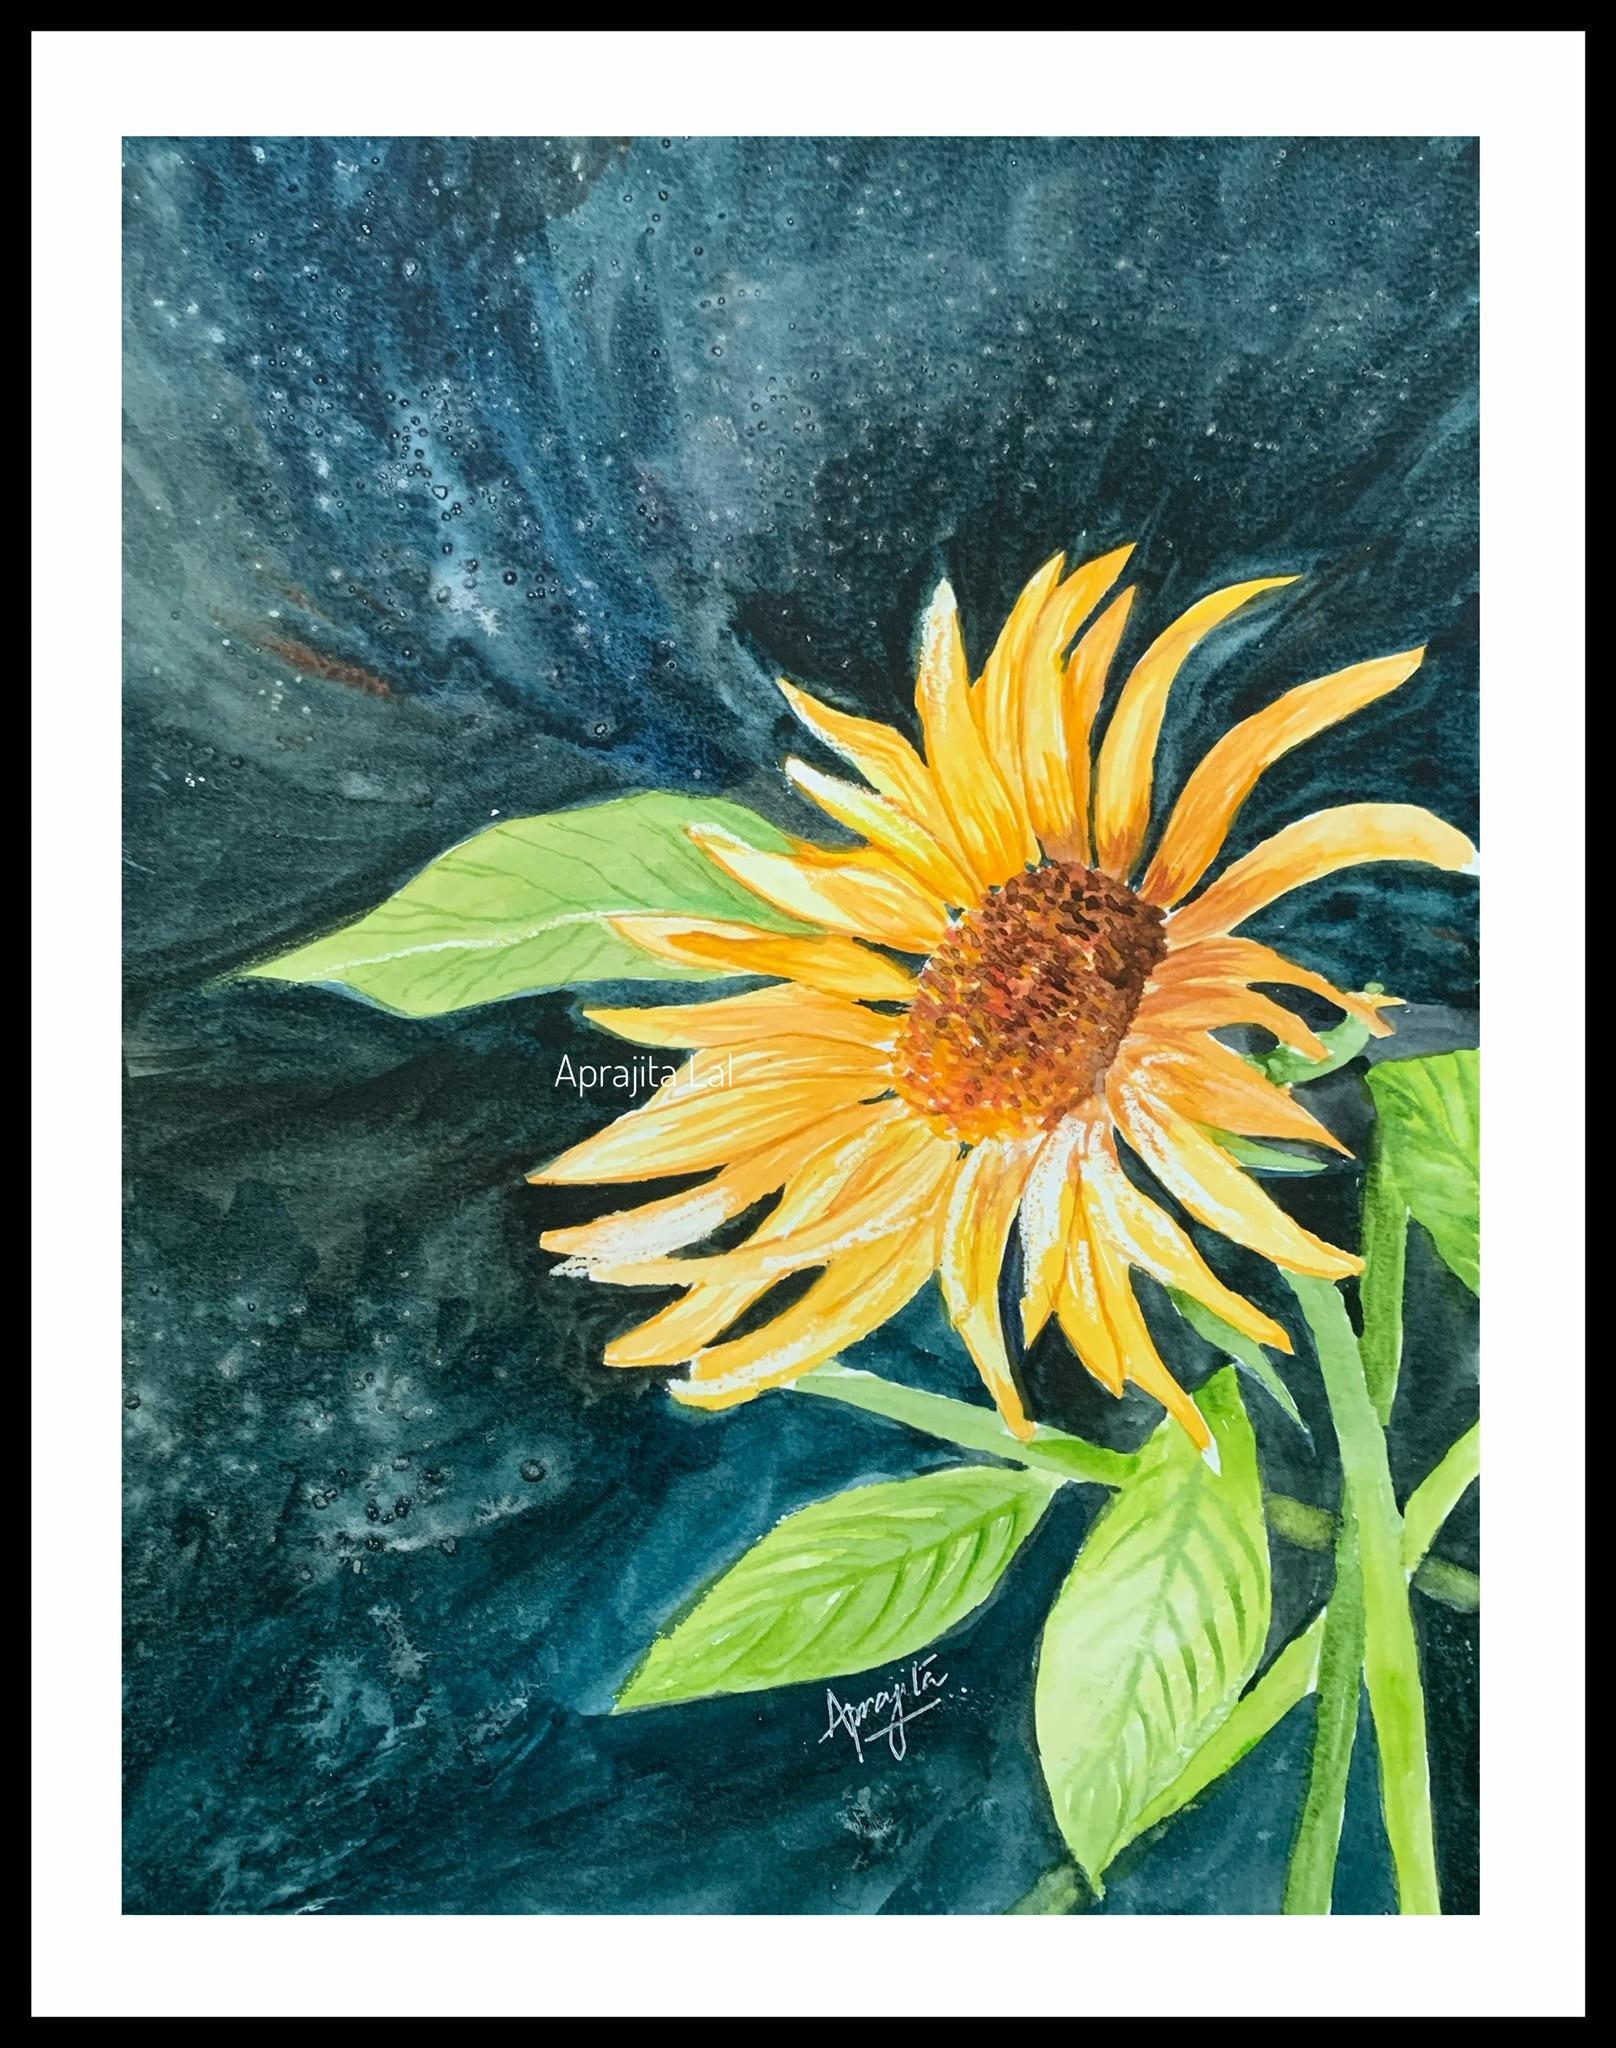 Sunflower original svysnf